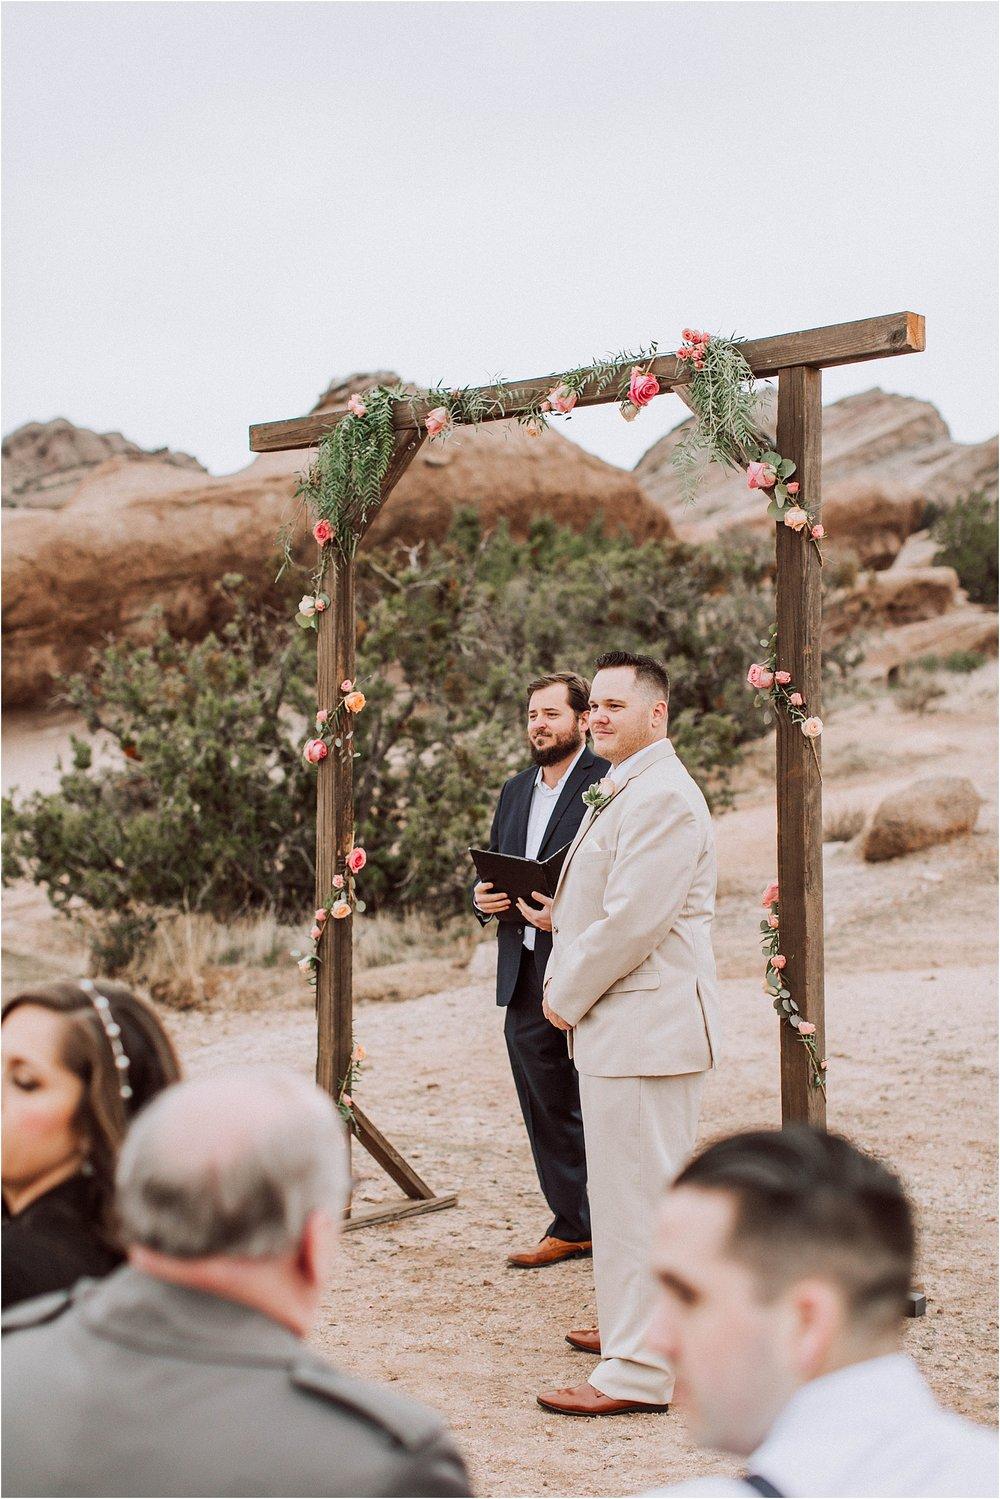 Vasquez Rocks Intimate Wedding & Elopement Photography - Ceremony Coverage